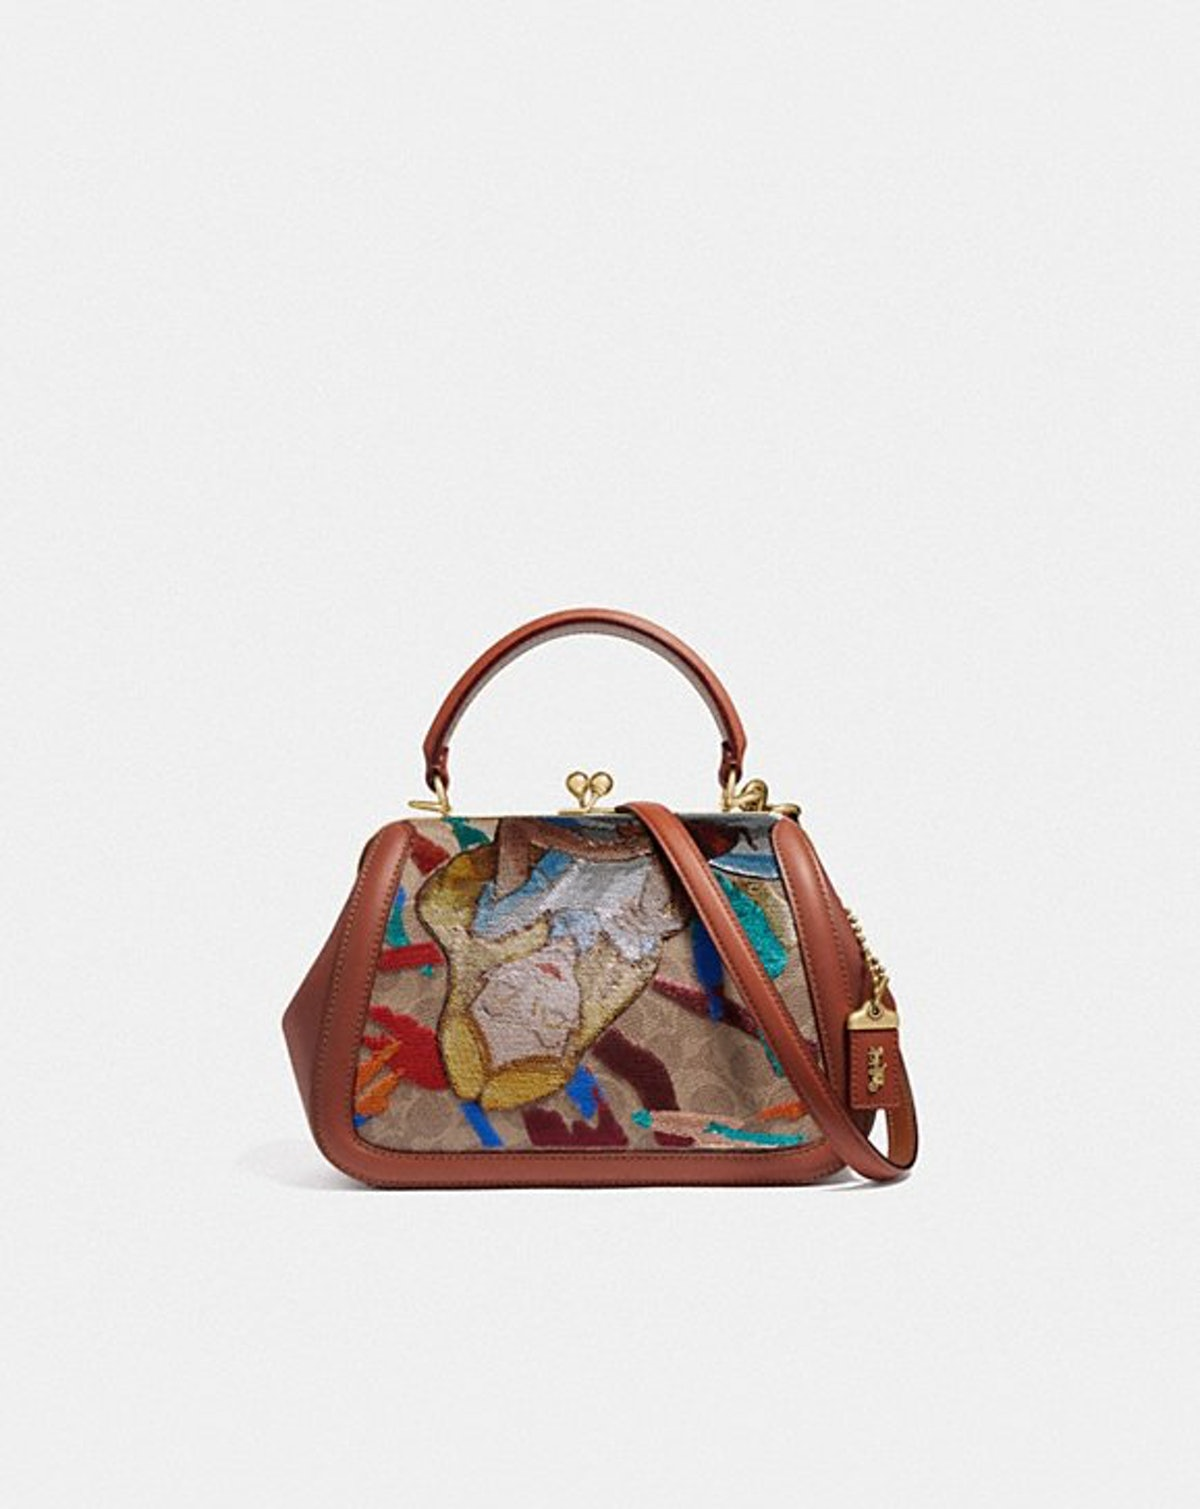 Disney X Coach Frame Bag 23 With Embellished Alice